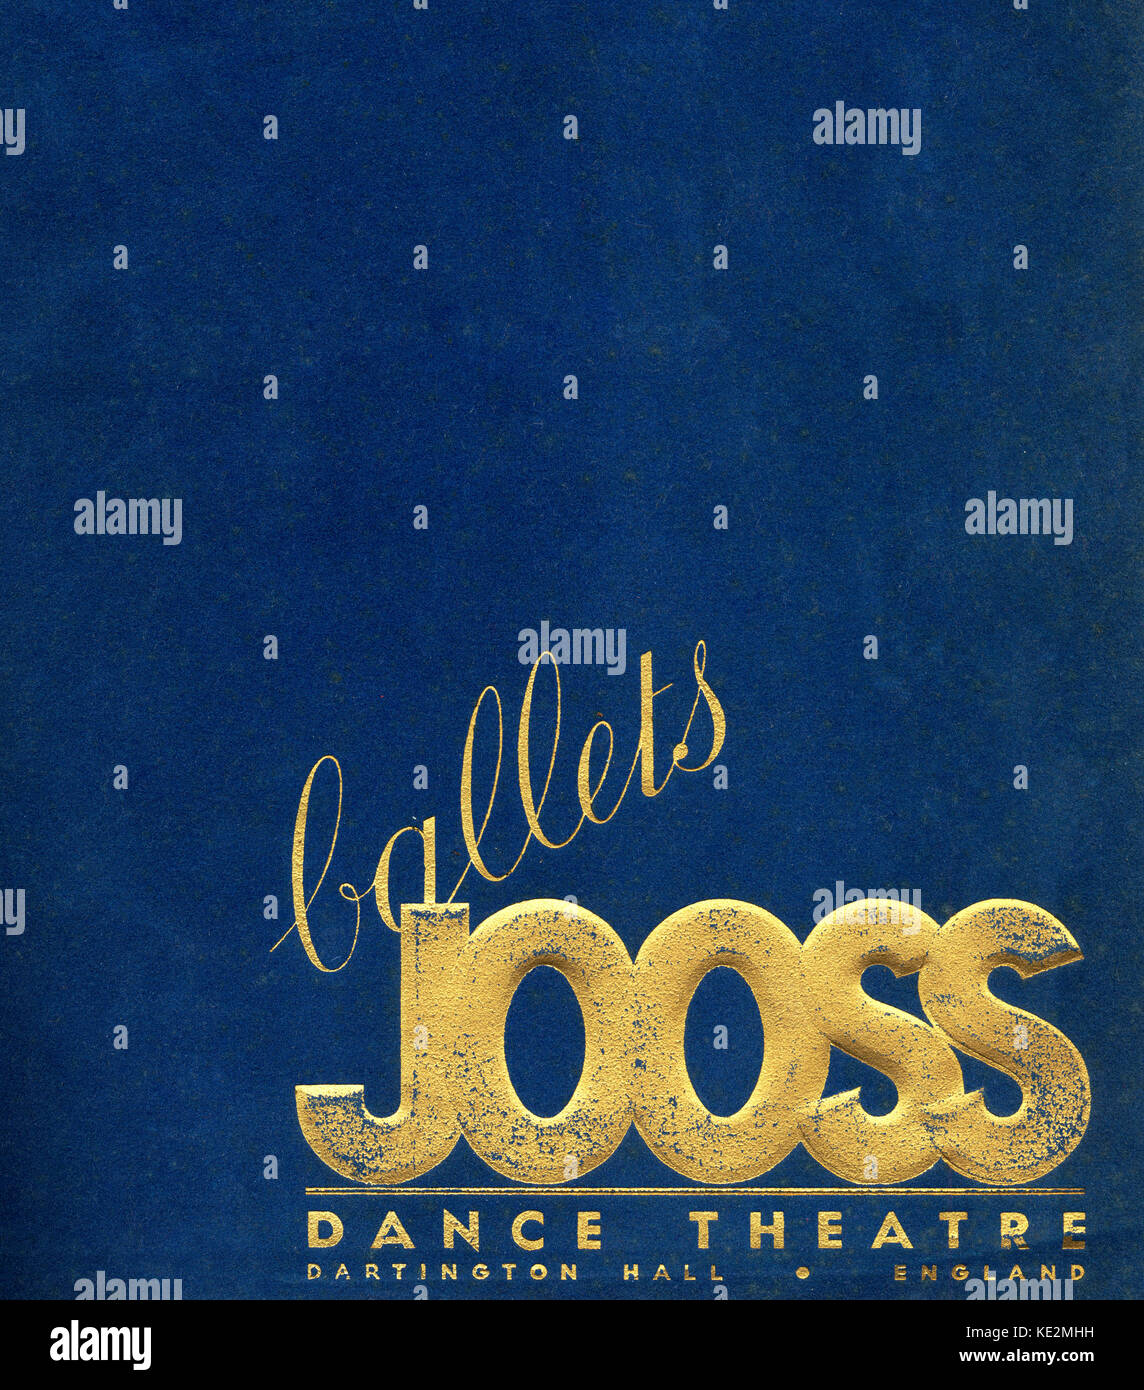 Ballets Jooss Dance Theatre programme cover Dartington Hall, England.  Directed by Kurt Jooss (1901–1979, German - Stock Image